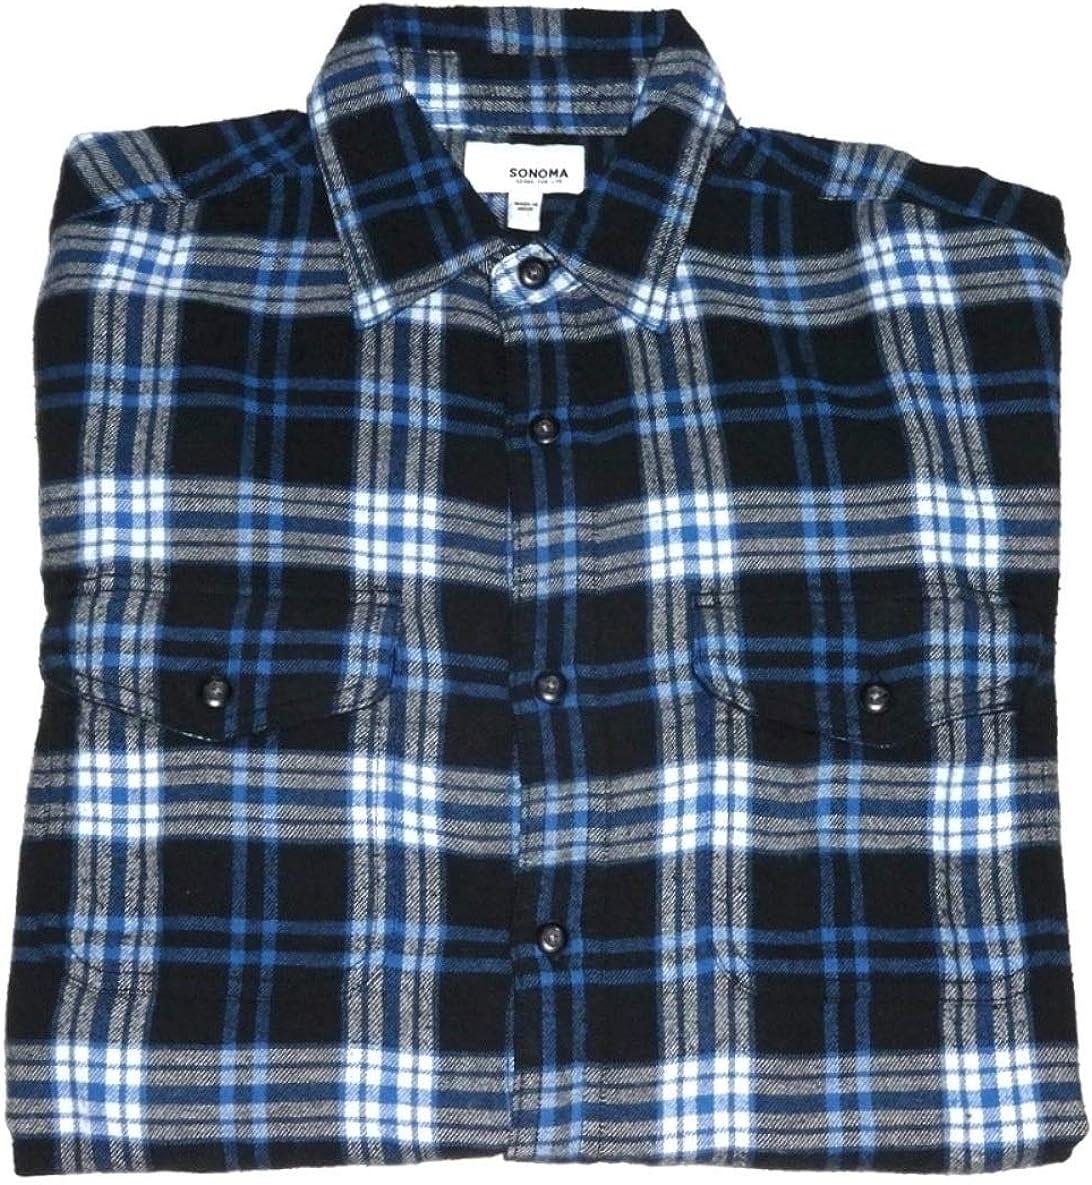 Sonoma Mens Classic Fit Flannel Long Sleeves Shirt Blue Black Plaid - 2 Chest Pockets